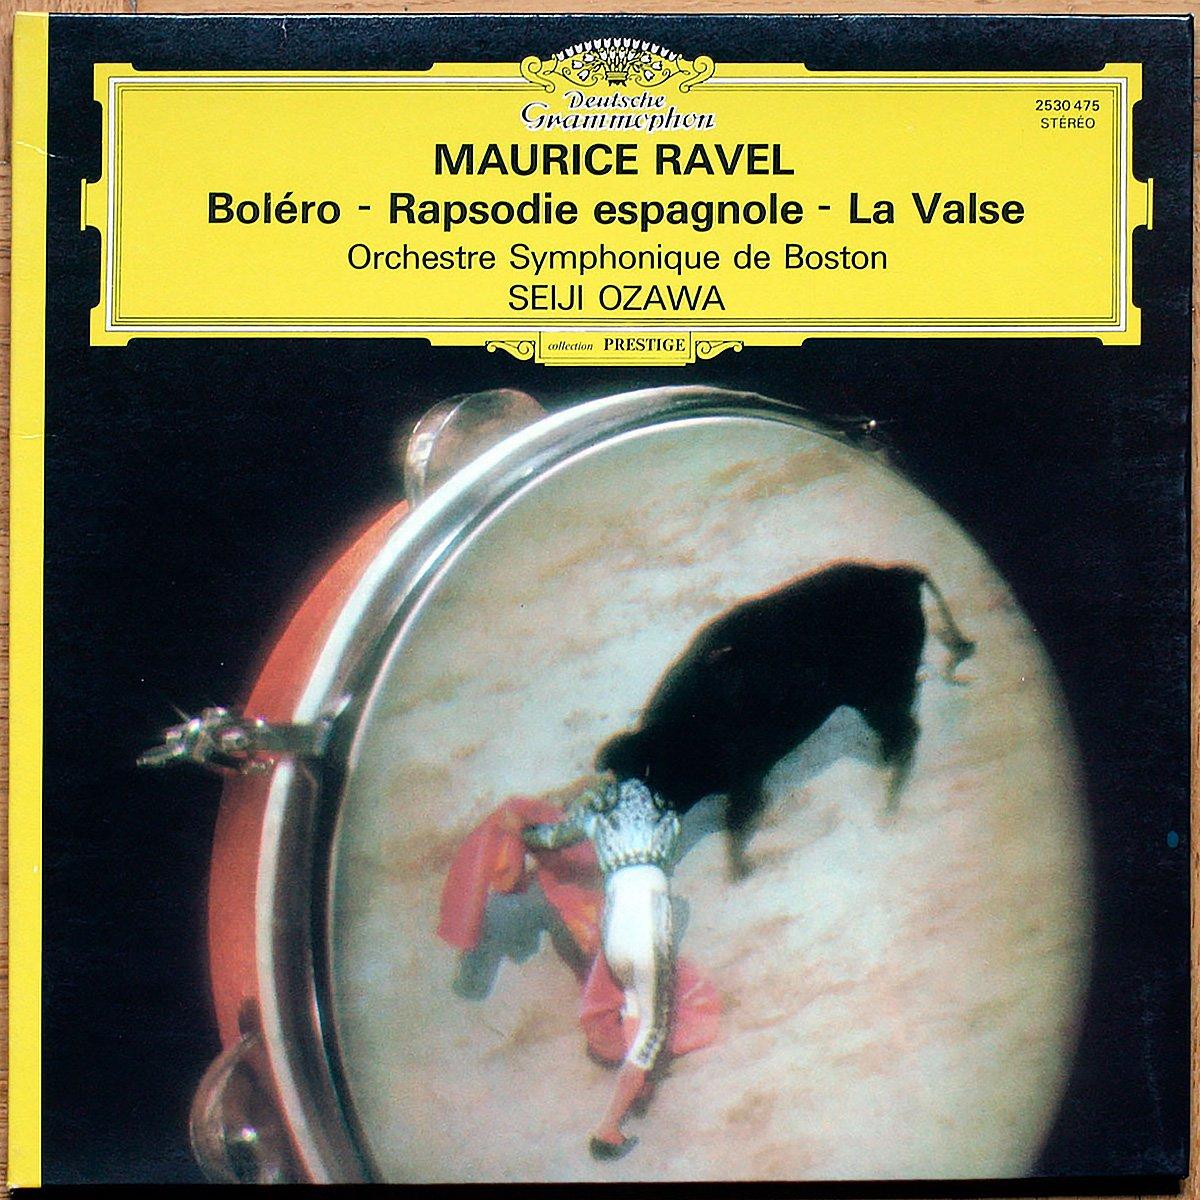 Ravel • Bolero • LRapsodie Espagnole • La Valse • DGG 2530 475 • Boston Symphony Orchestra • Seiji Ozawa